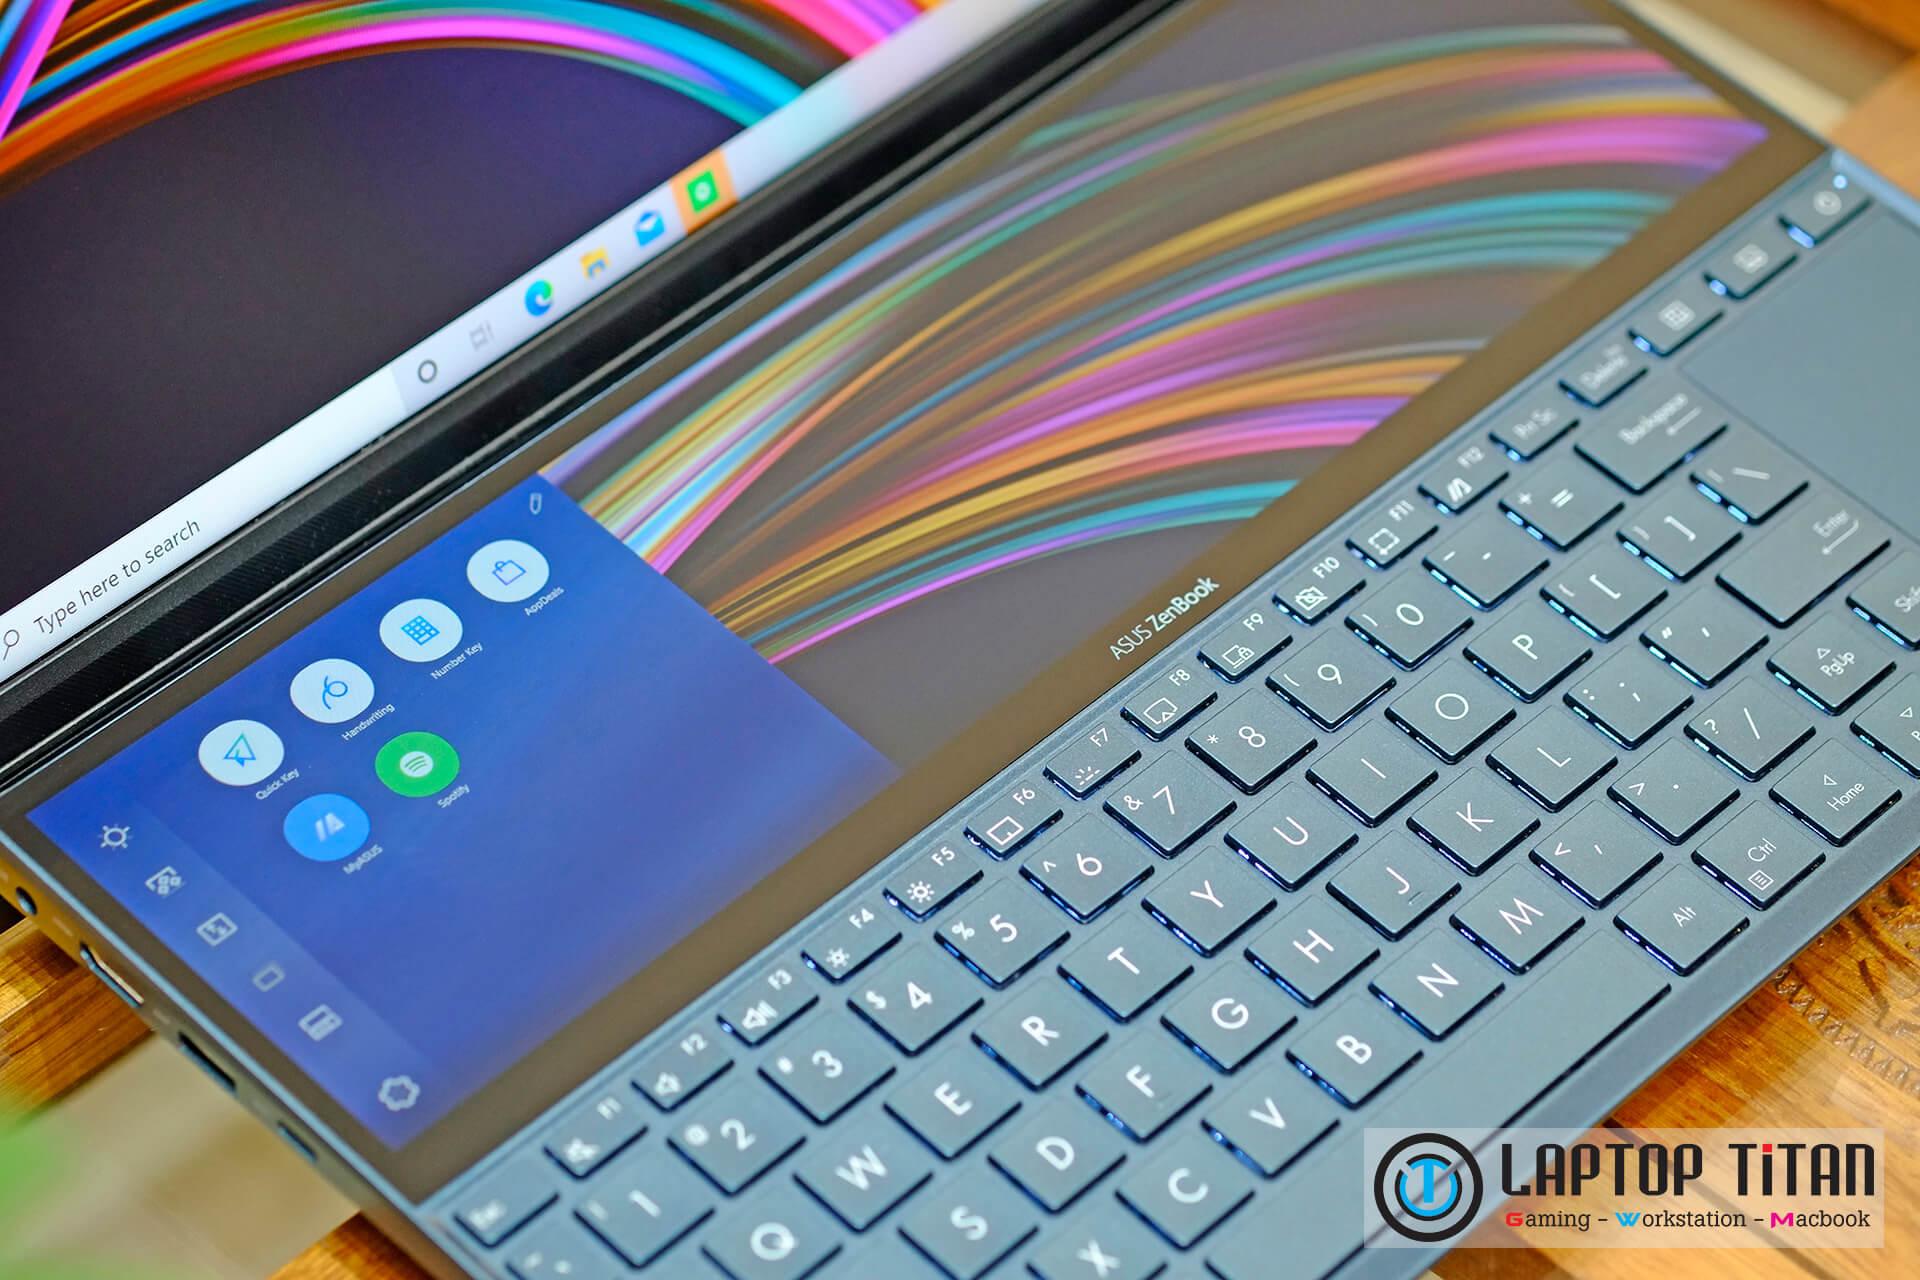 Asus Zenbook Duo Ux481Fl Laptoptitan 05